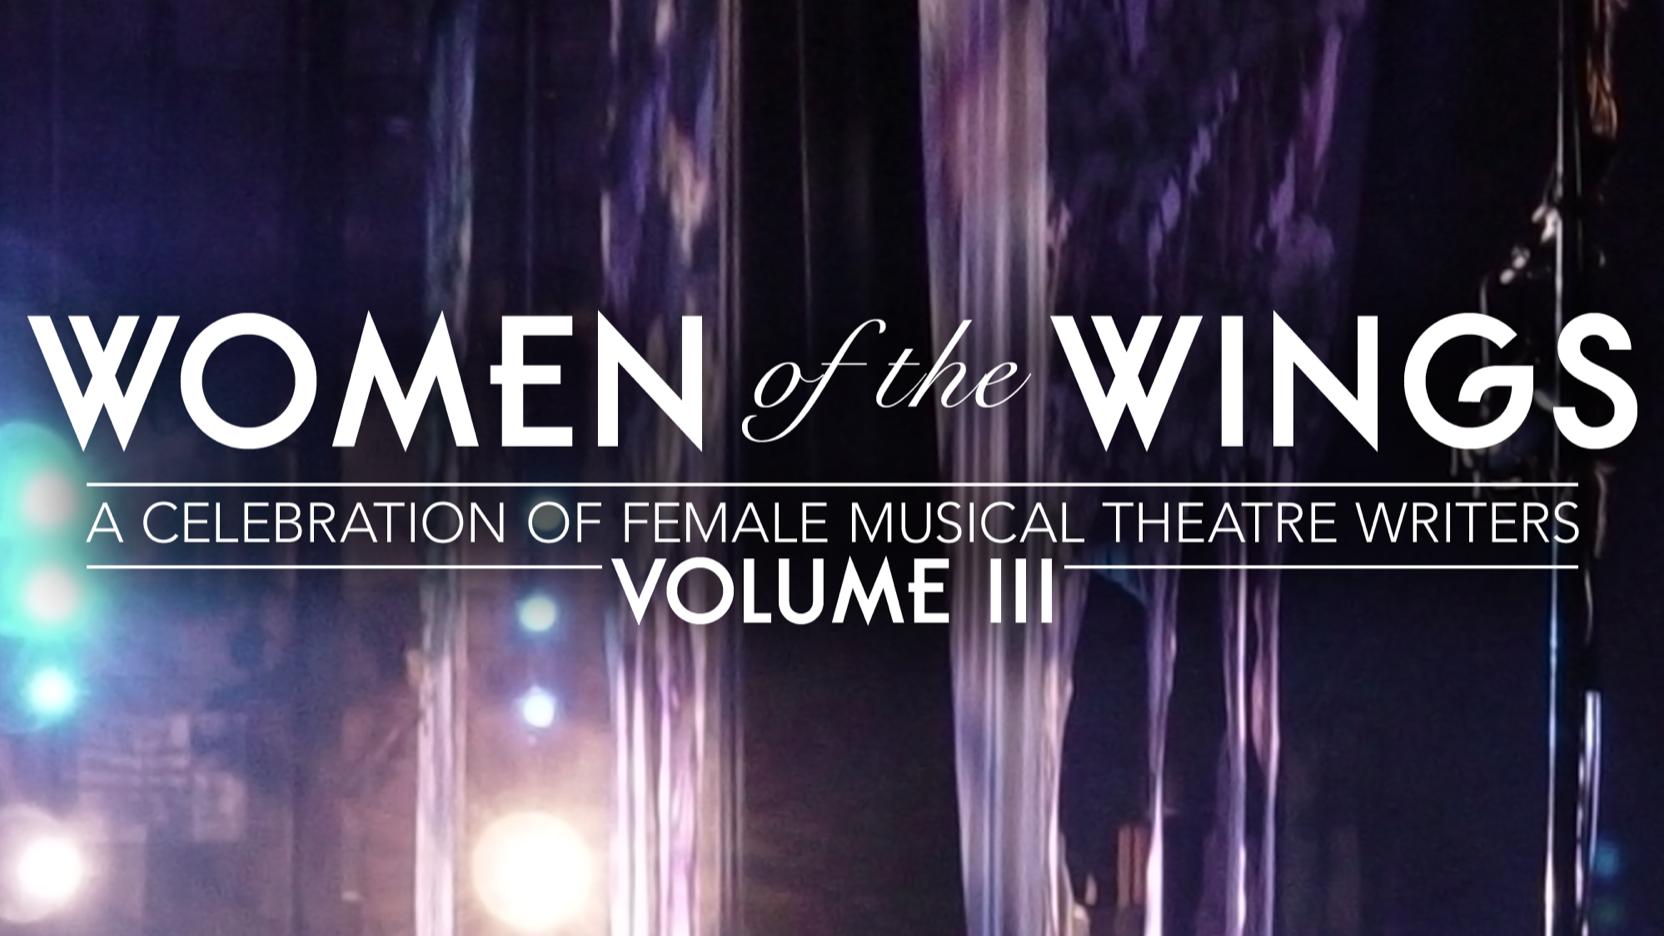 Women of the Wings Vol III Image